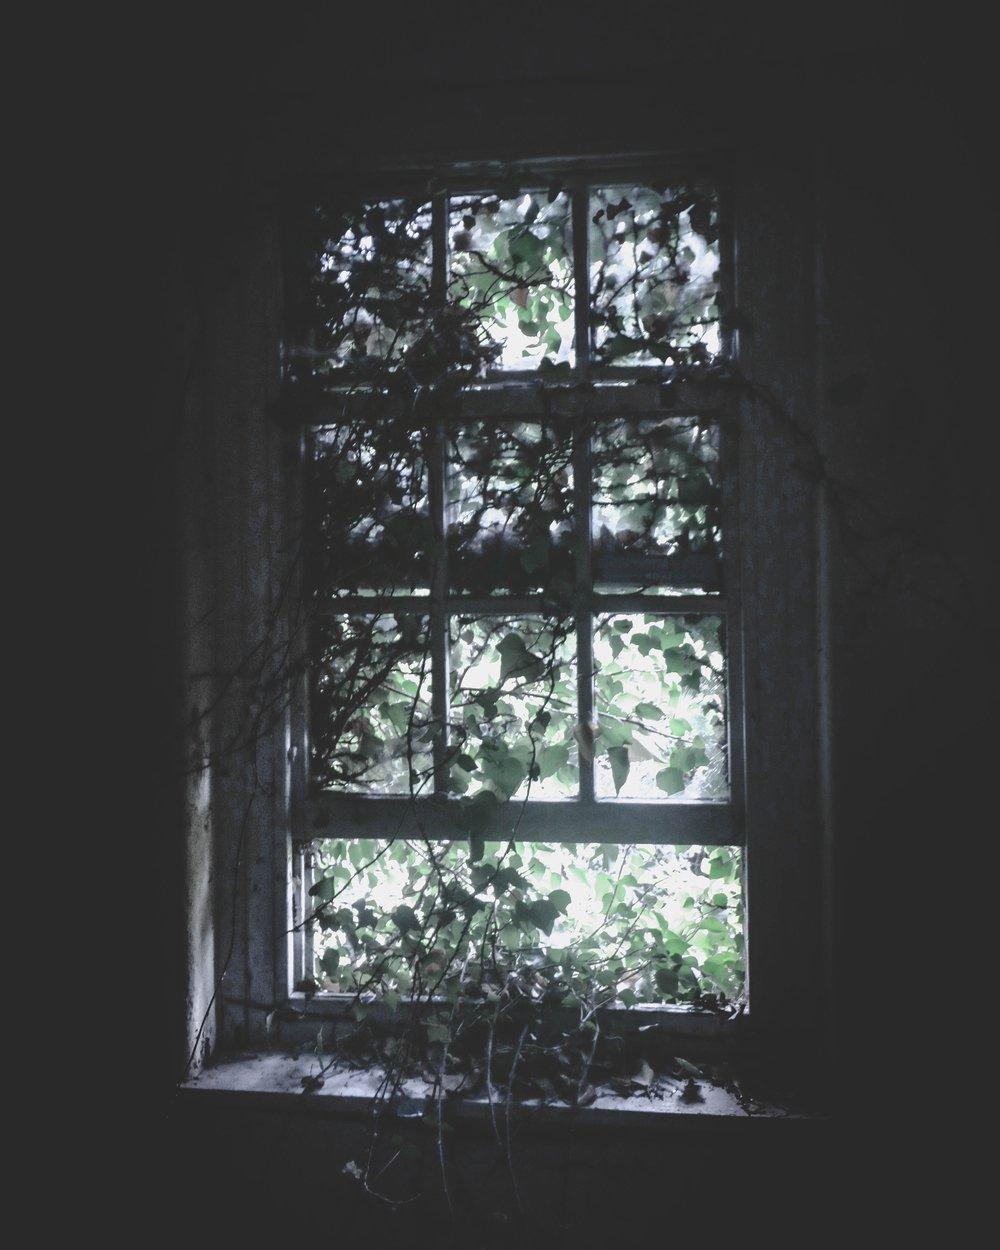 abandoned-abandoned-building-black-and-white-761529.jpg